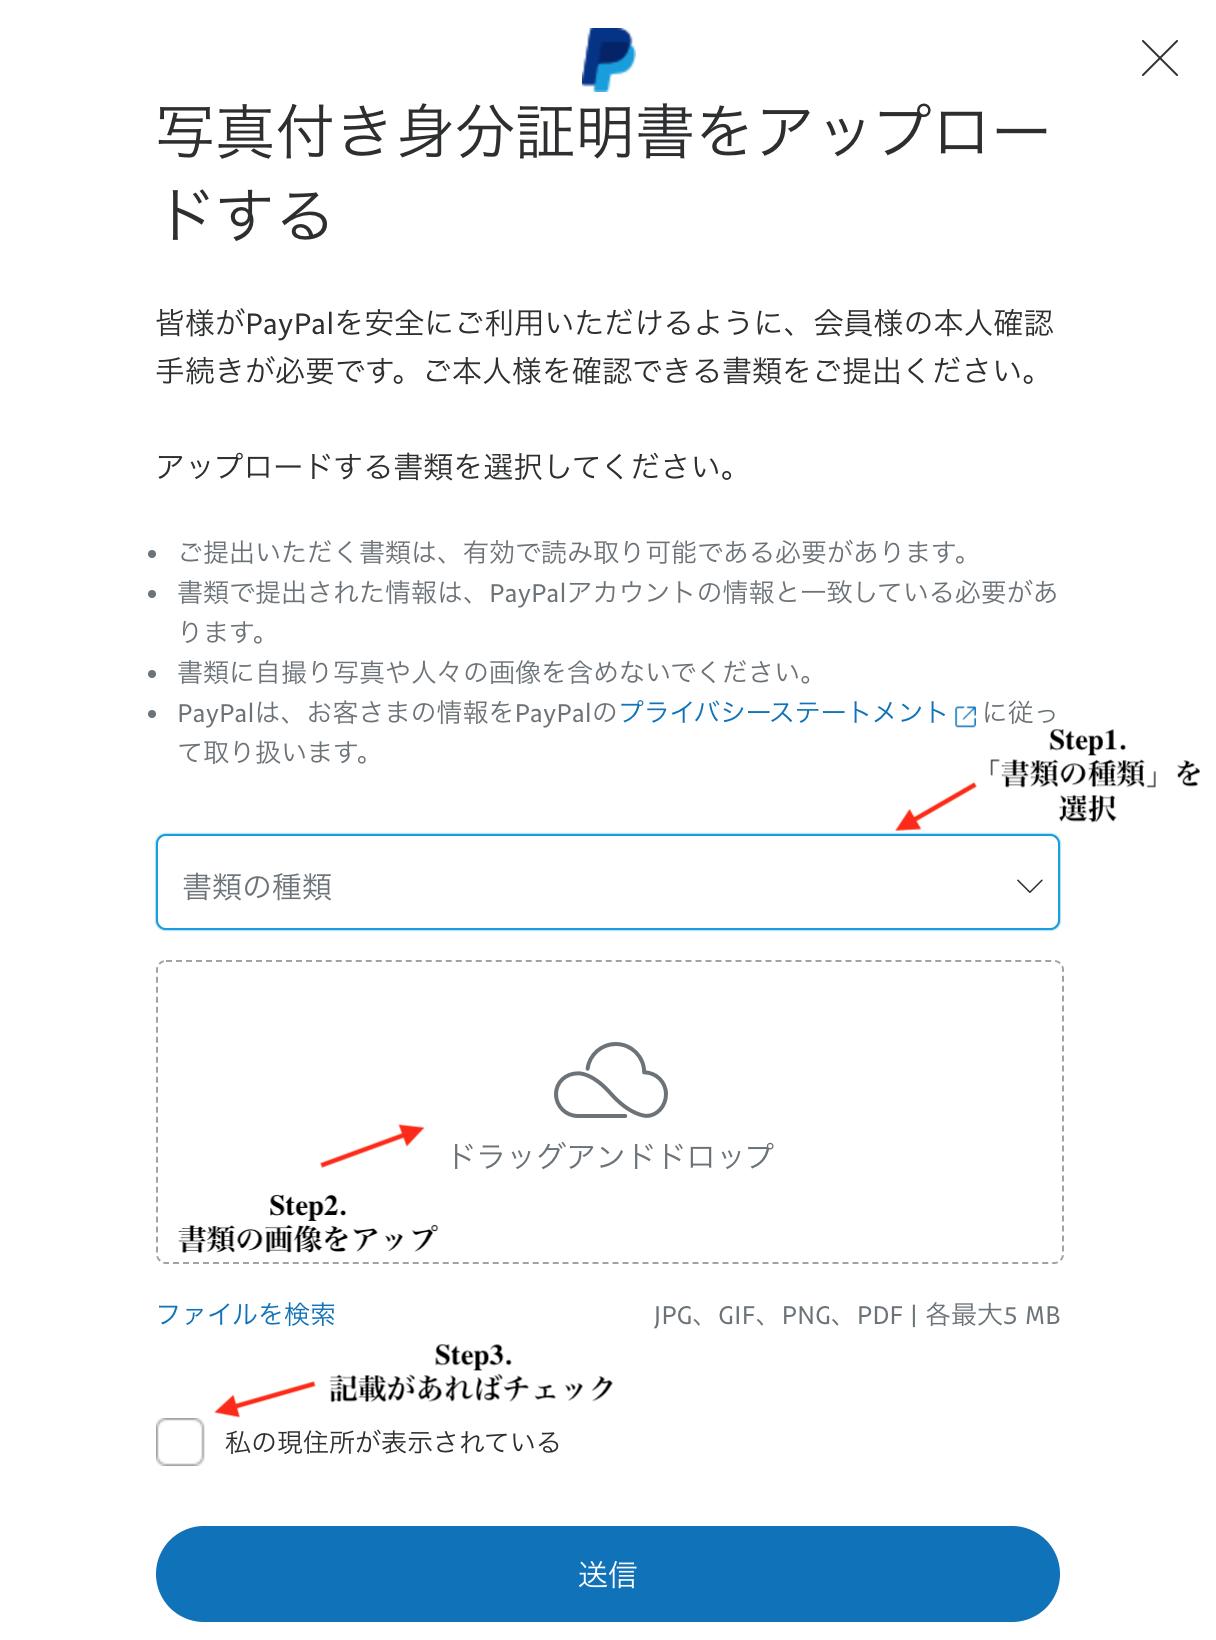 PayPal 身分証明書をアップロード